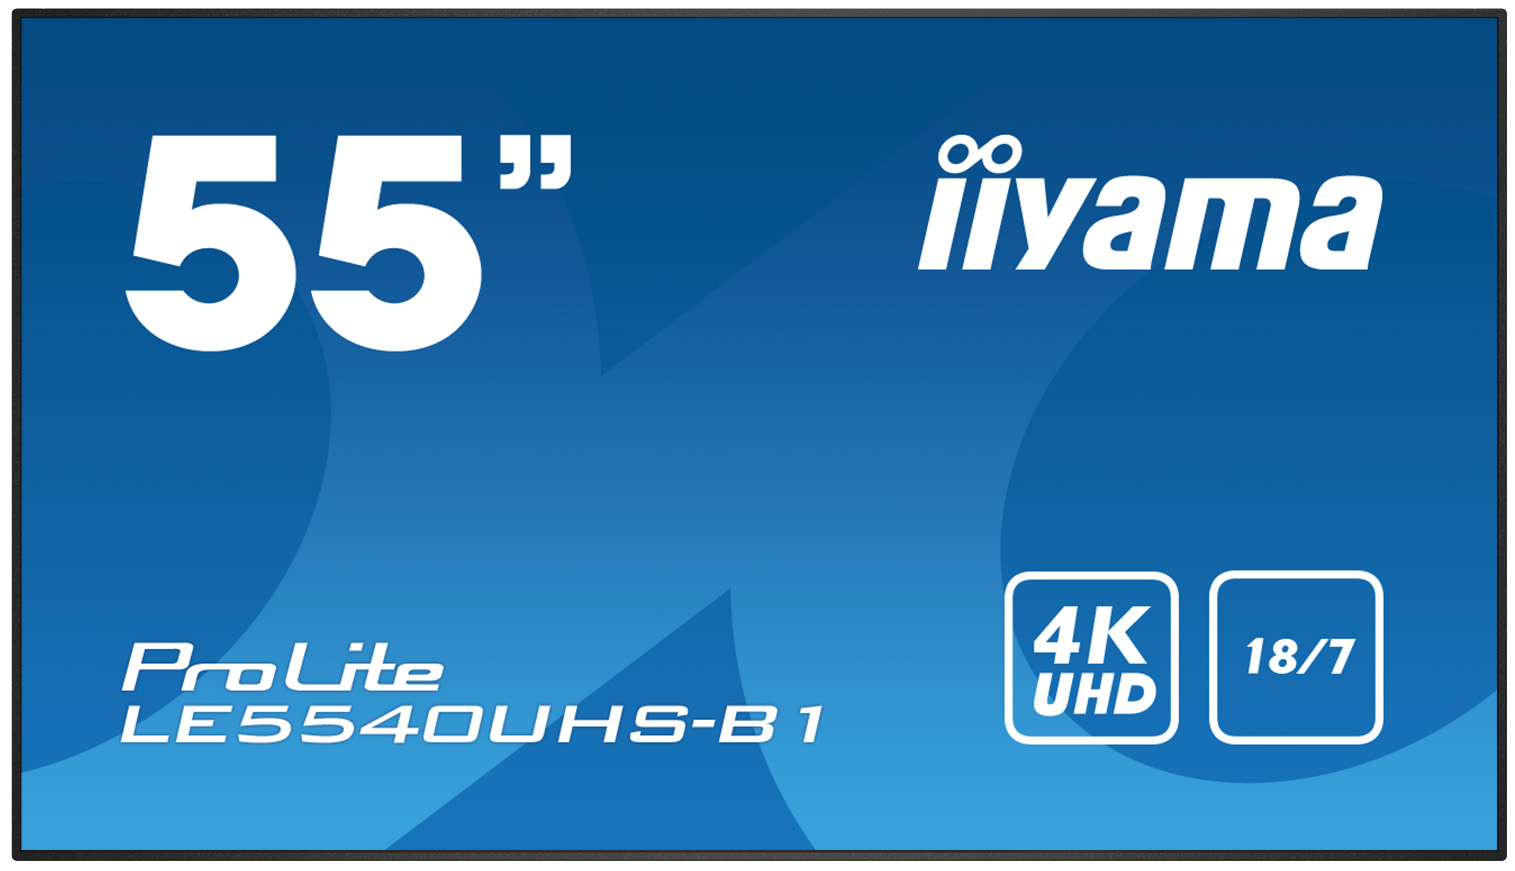 "55"" iiyama LE5540UHS-B1 - AMVA3,4K UHD,8ms,350cd/m2, 4000:1,16:9,VGA,HDMI,DVI,USB,RS232,RJ45,repro"